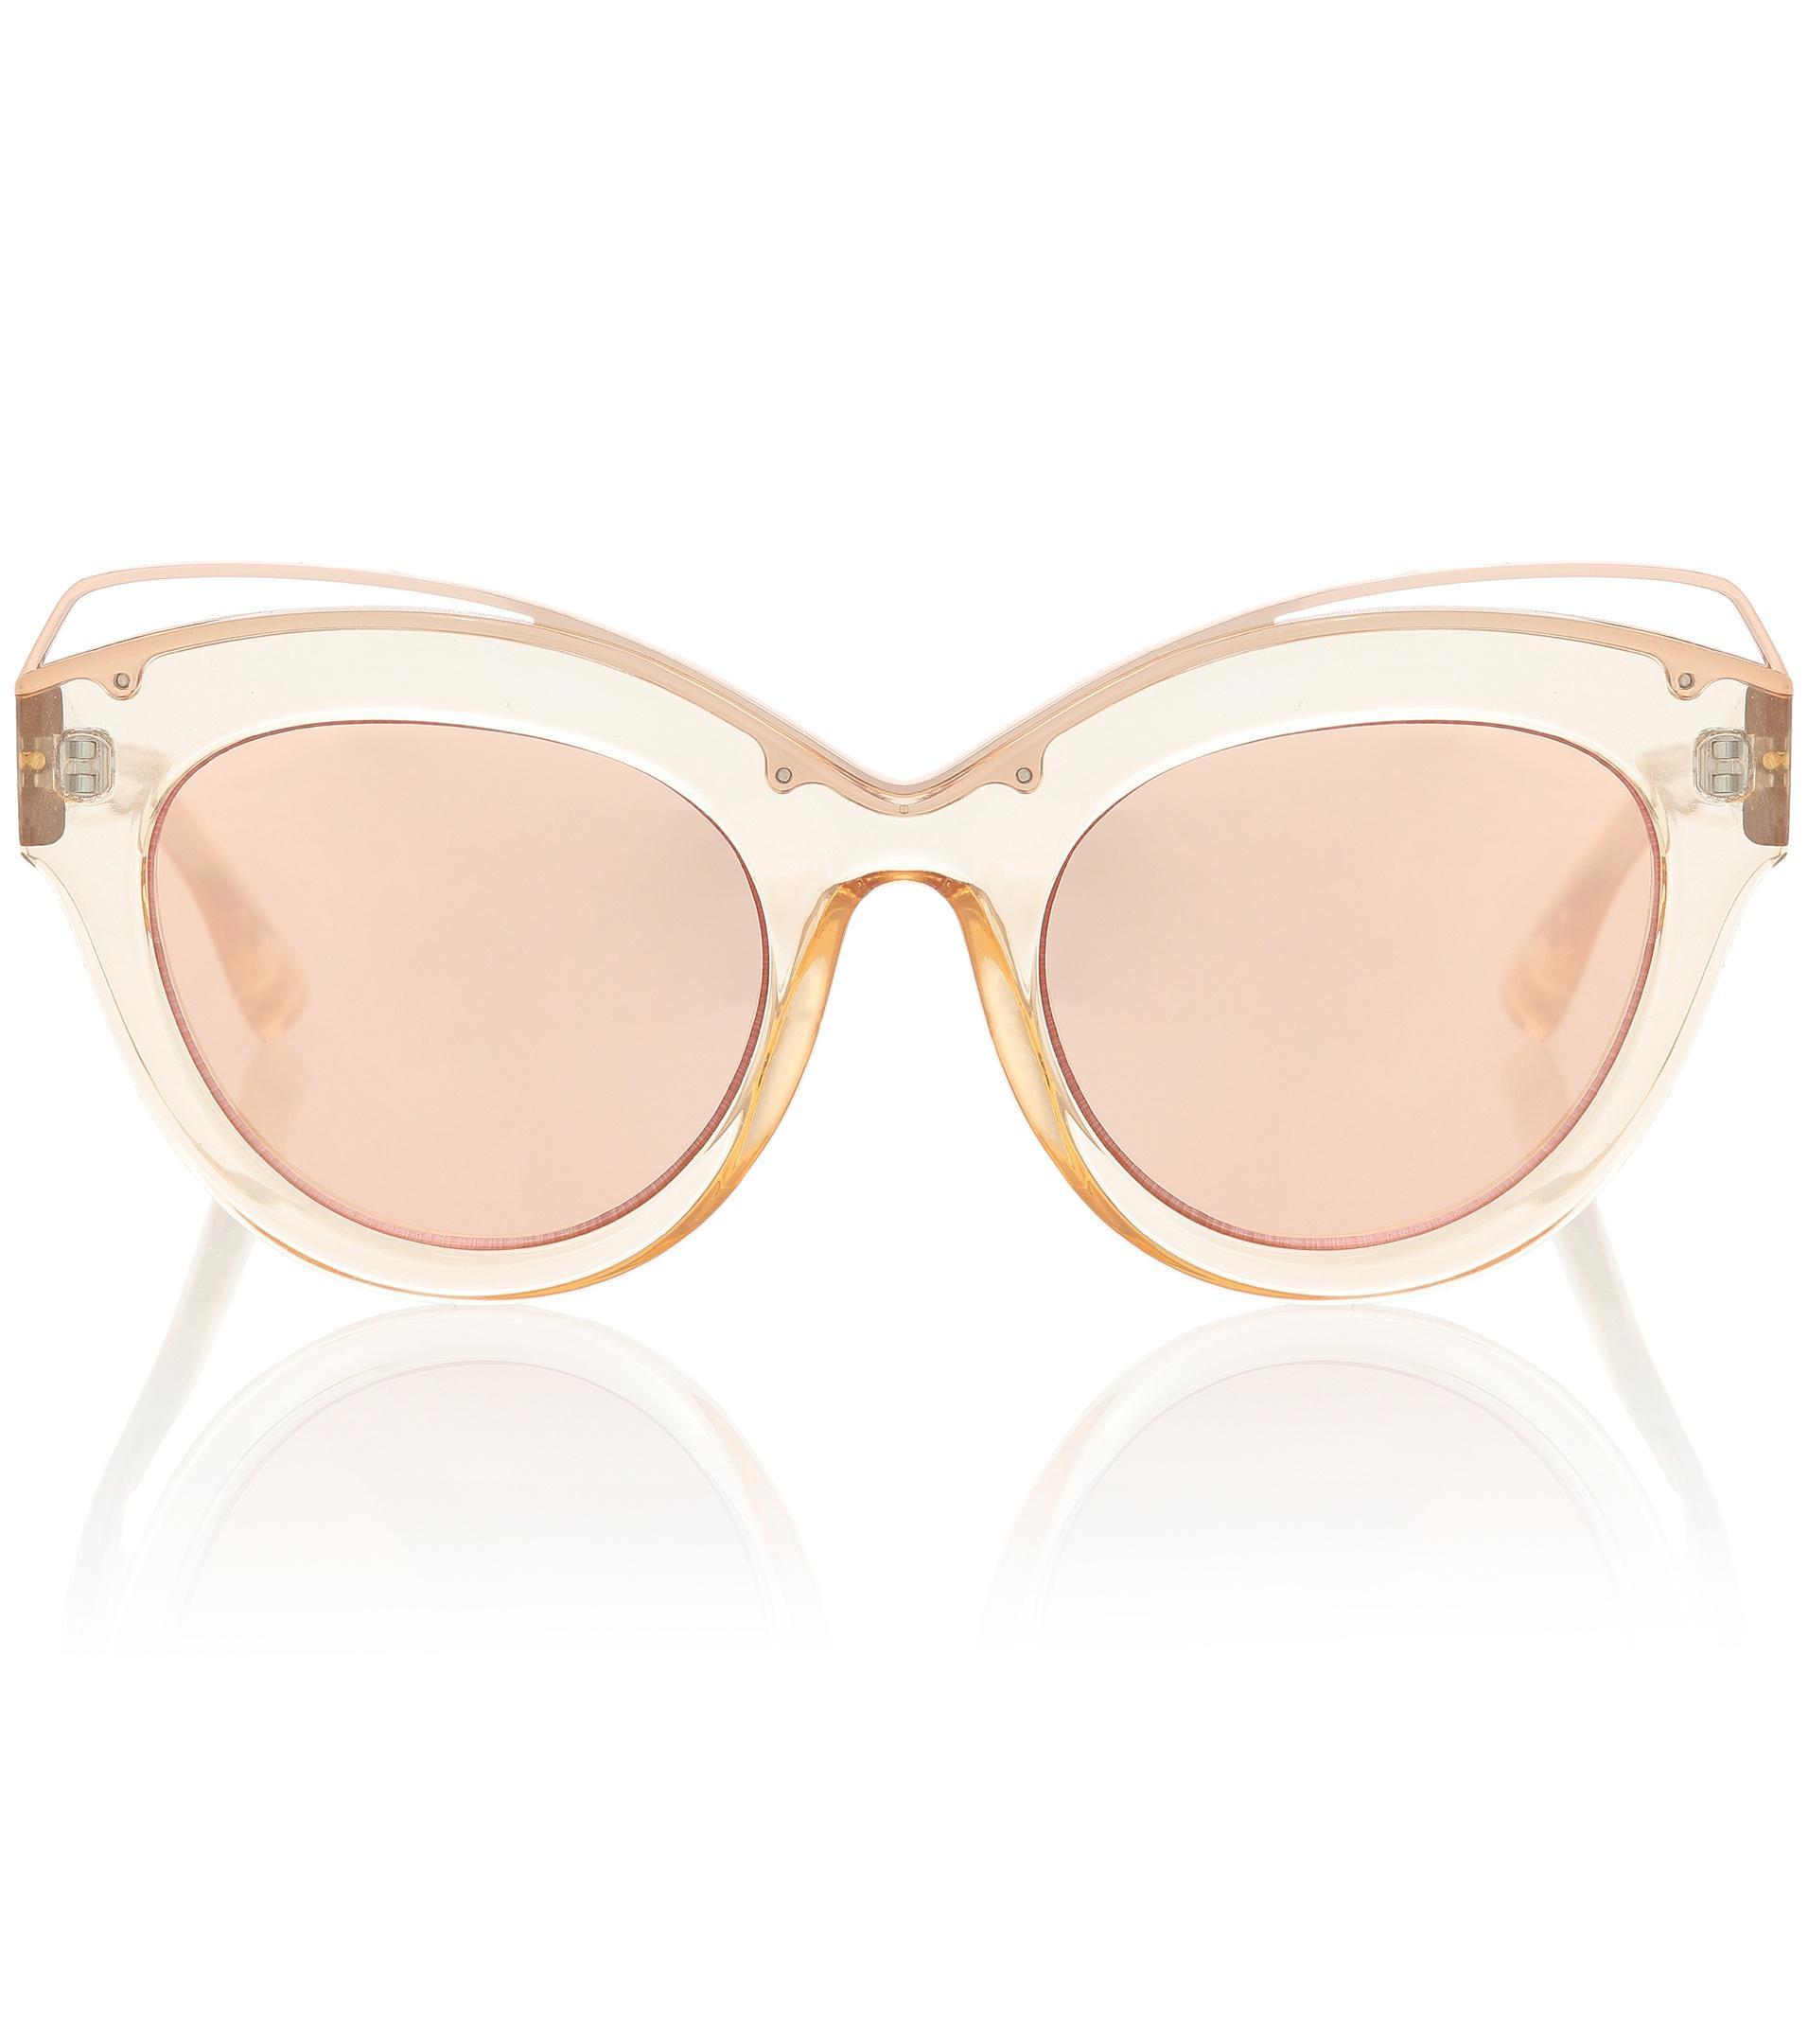 991b60087366 Specs Pink Sonnenbrille Lyst In Le Halogazer lu1JTc3K5F